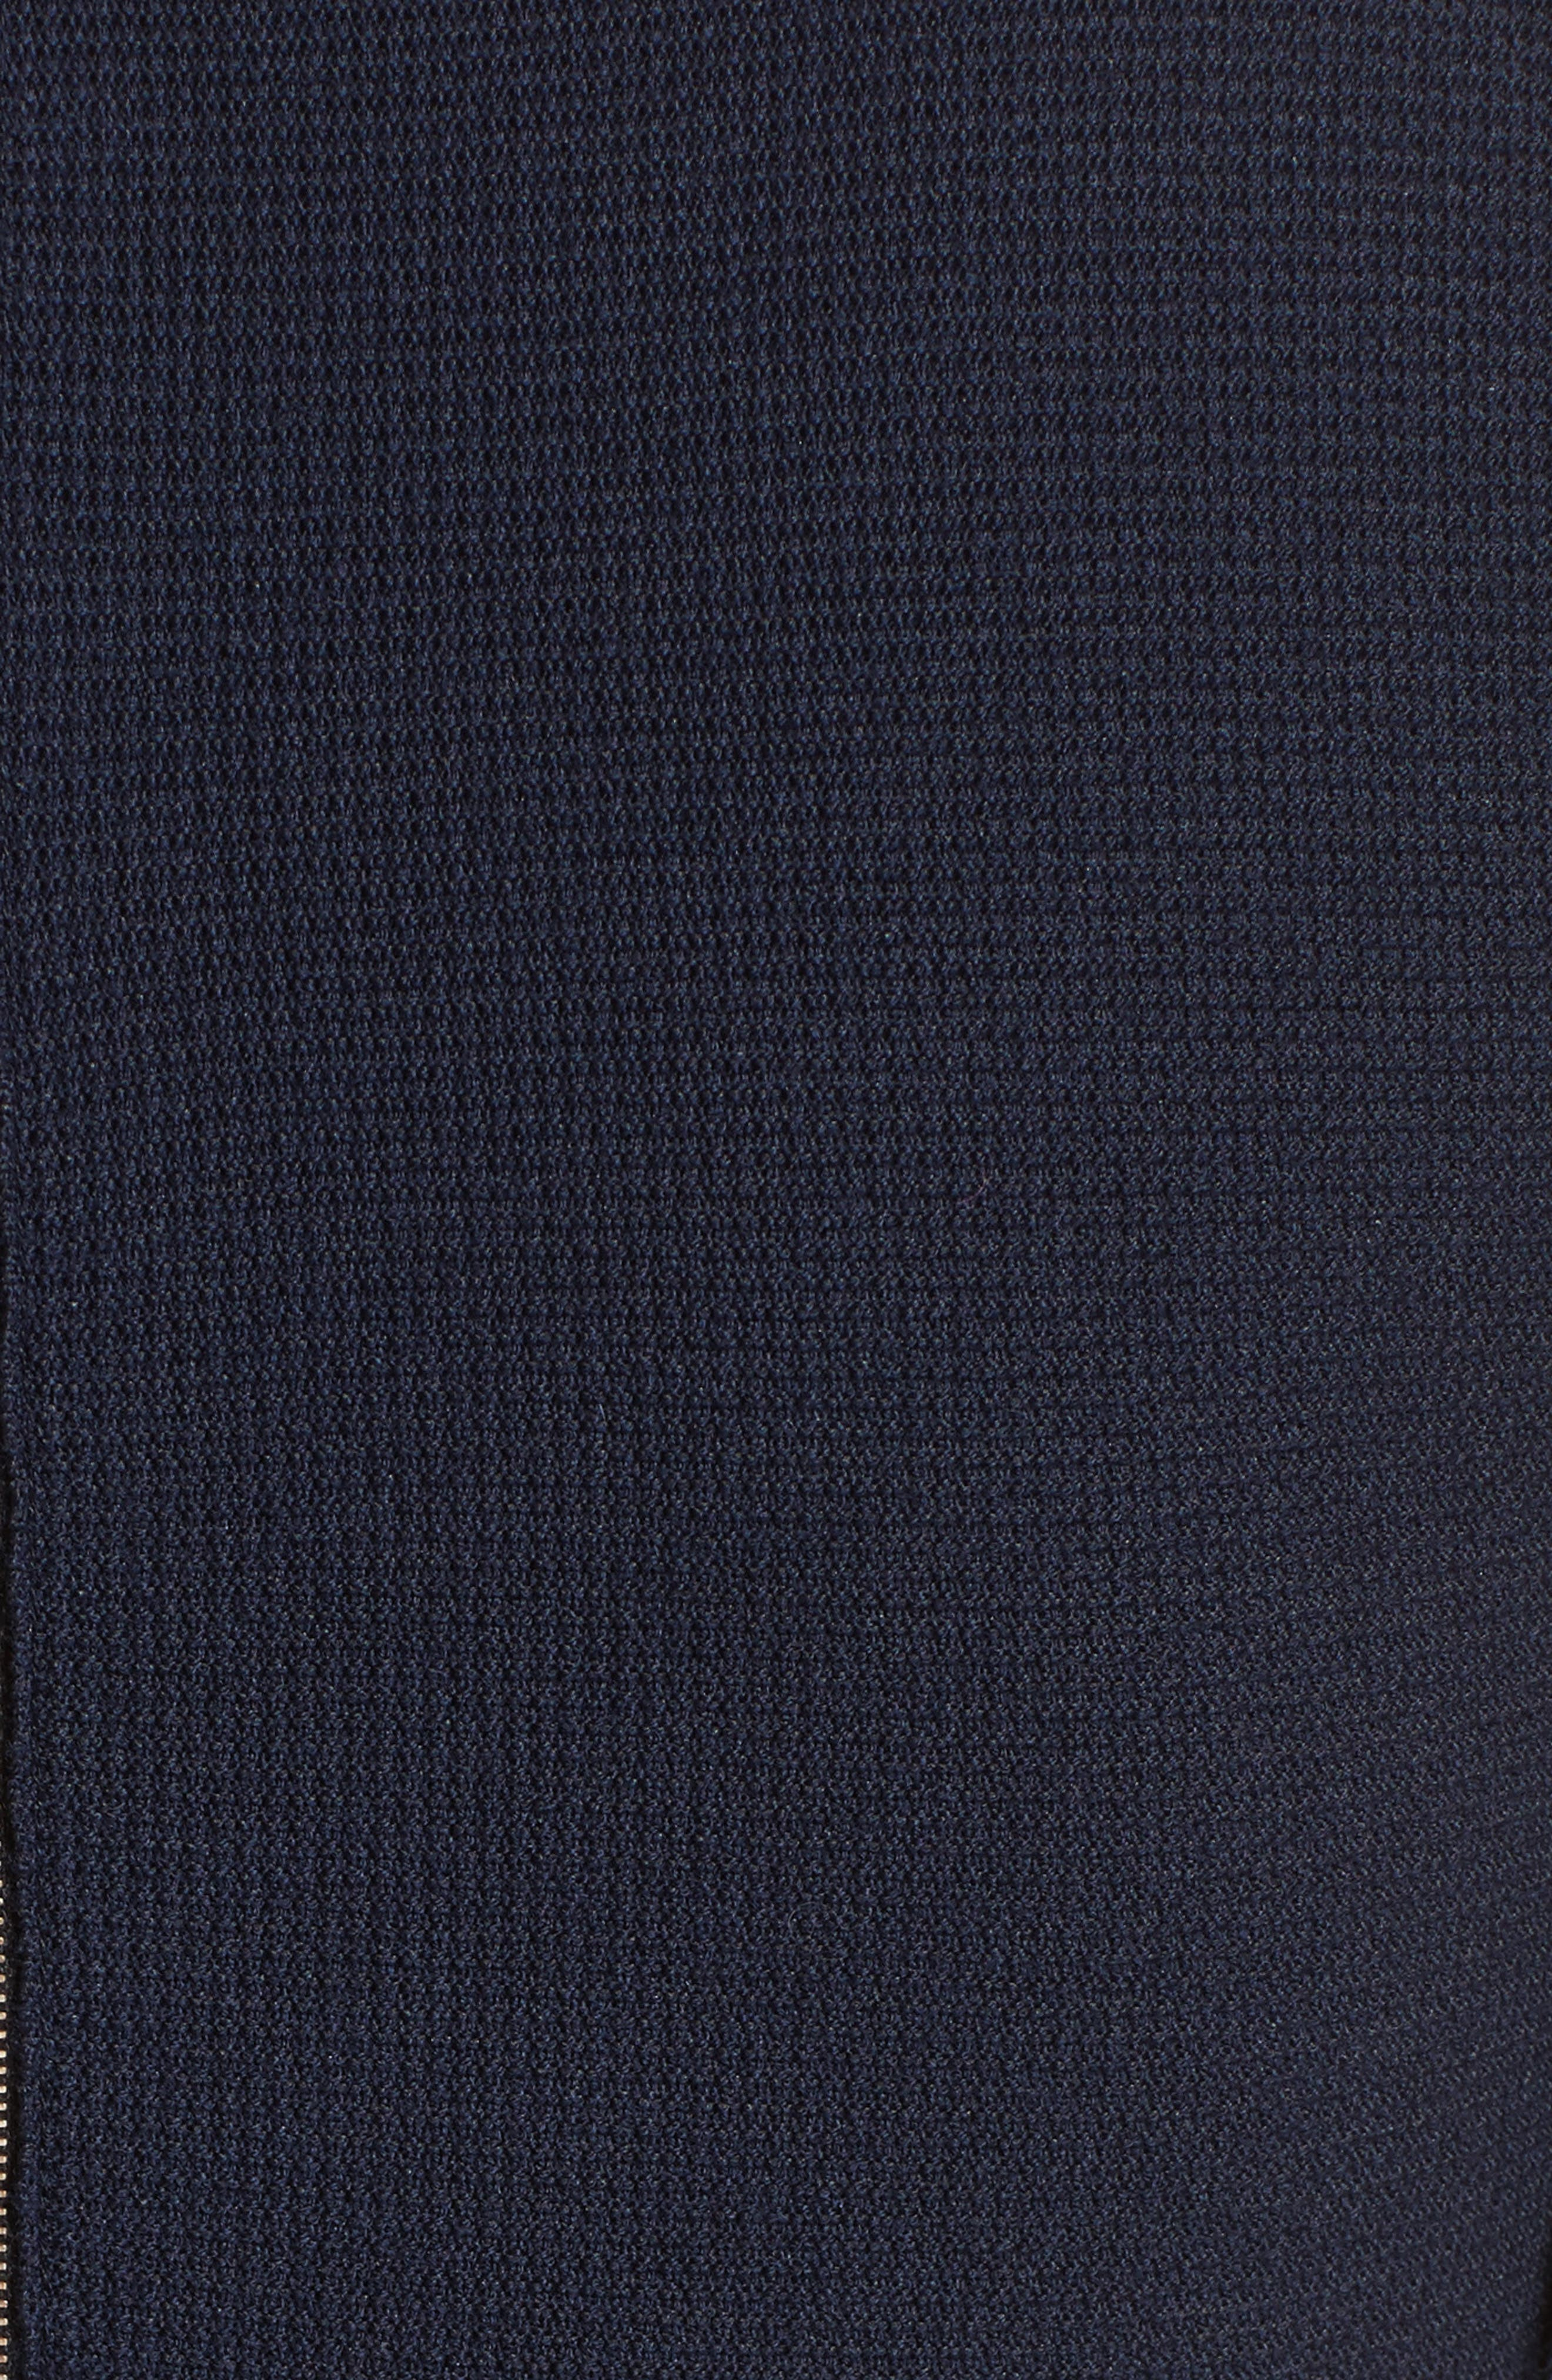 Wool Blend Knit Scallop Dress,                             Alternate thumbnail 5, color,                             400